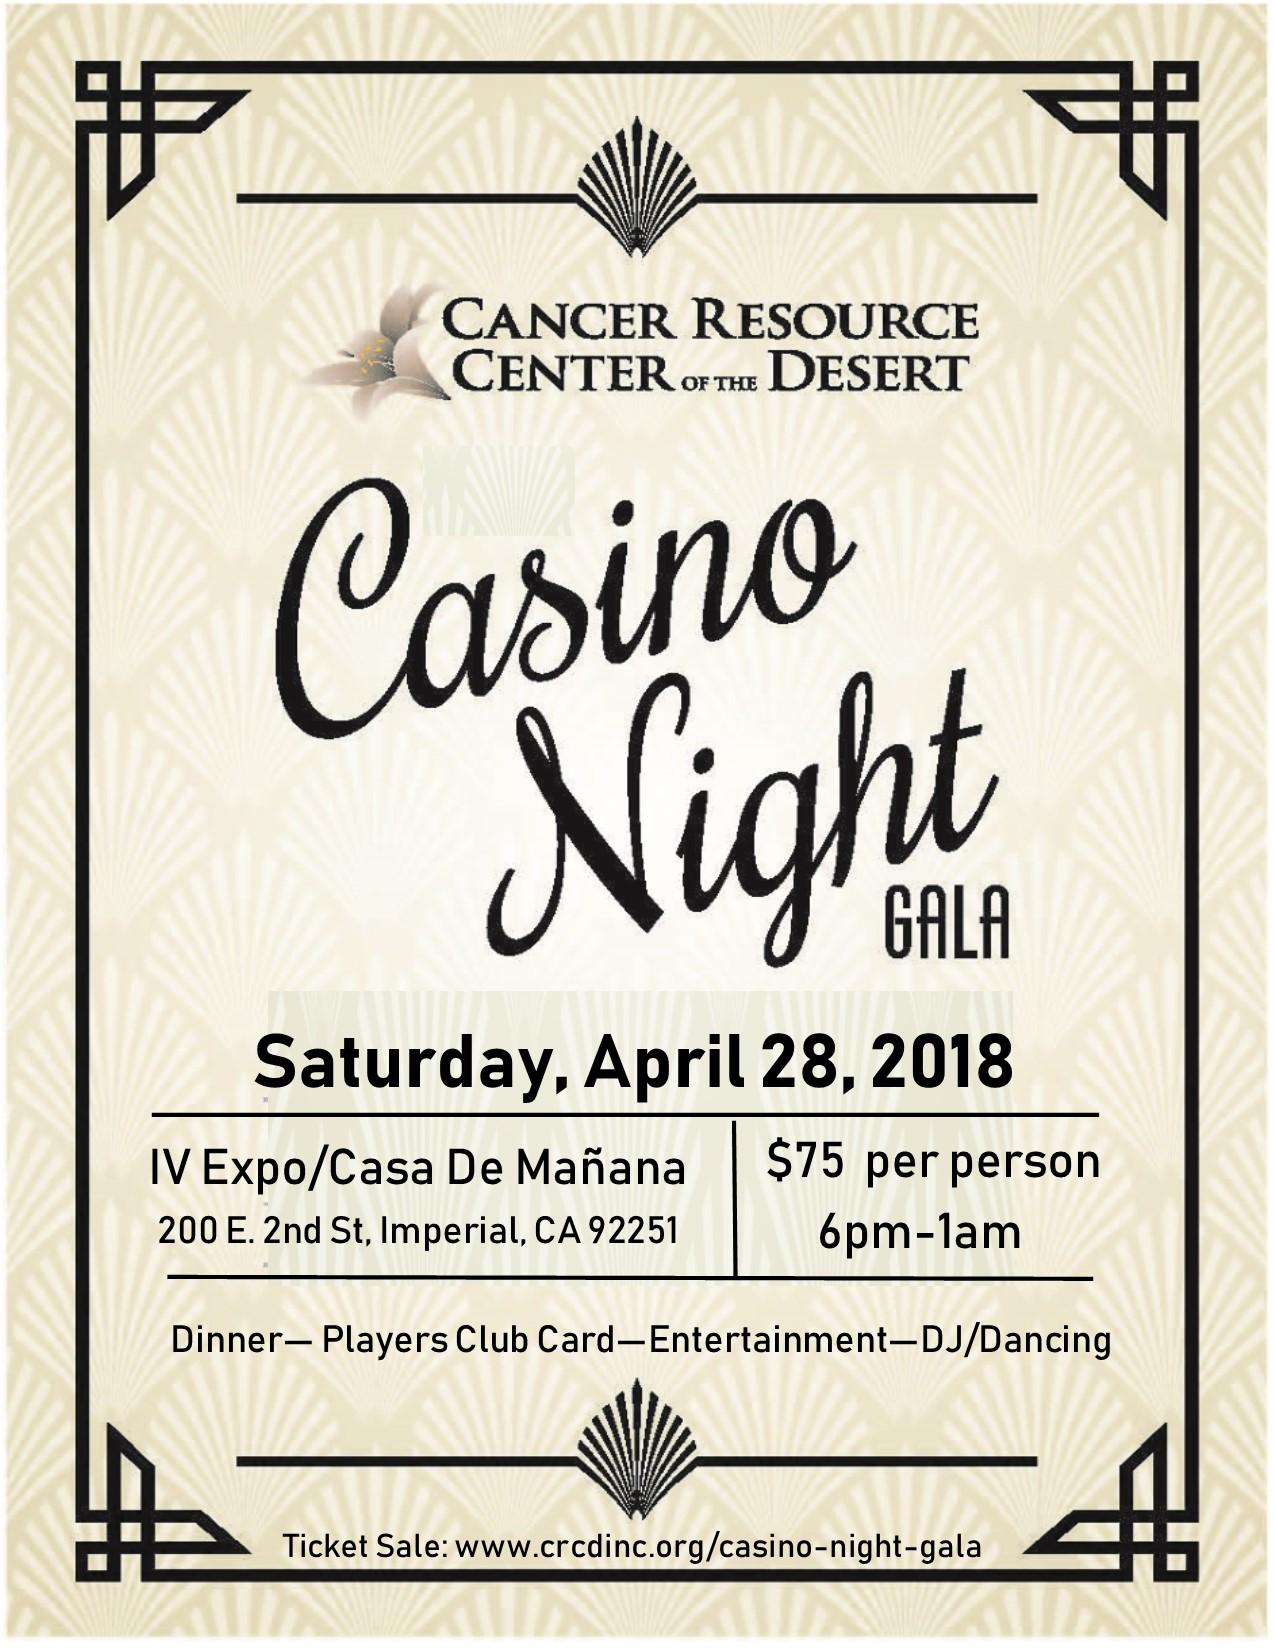 Casino Night Gala Flyer.jpg